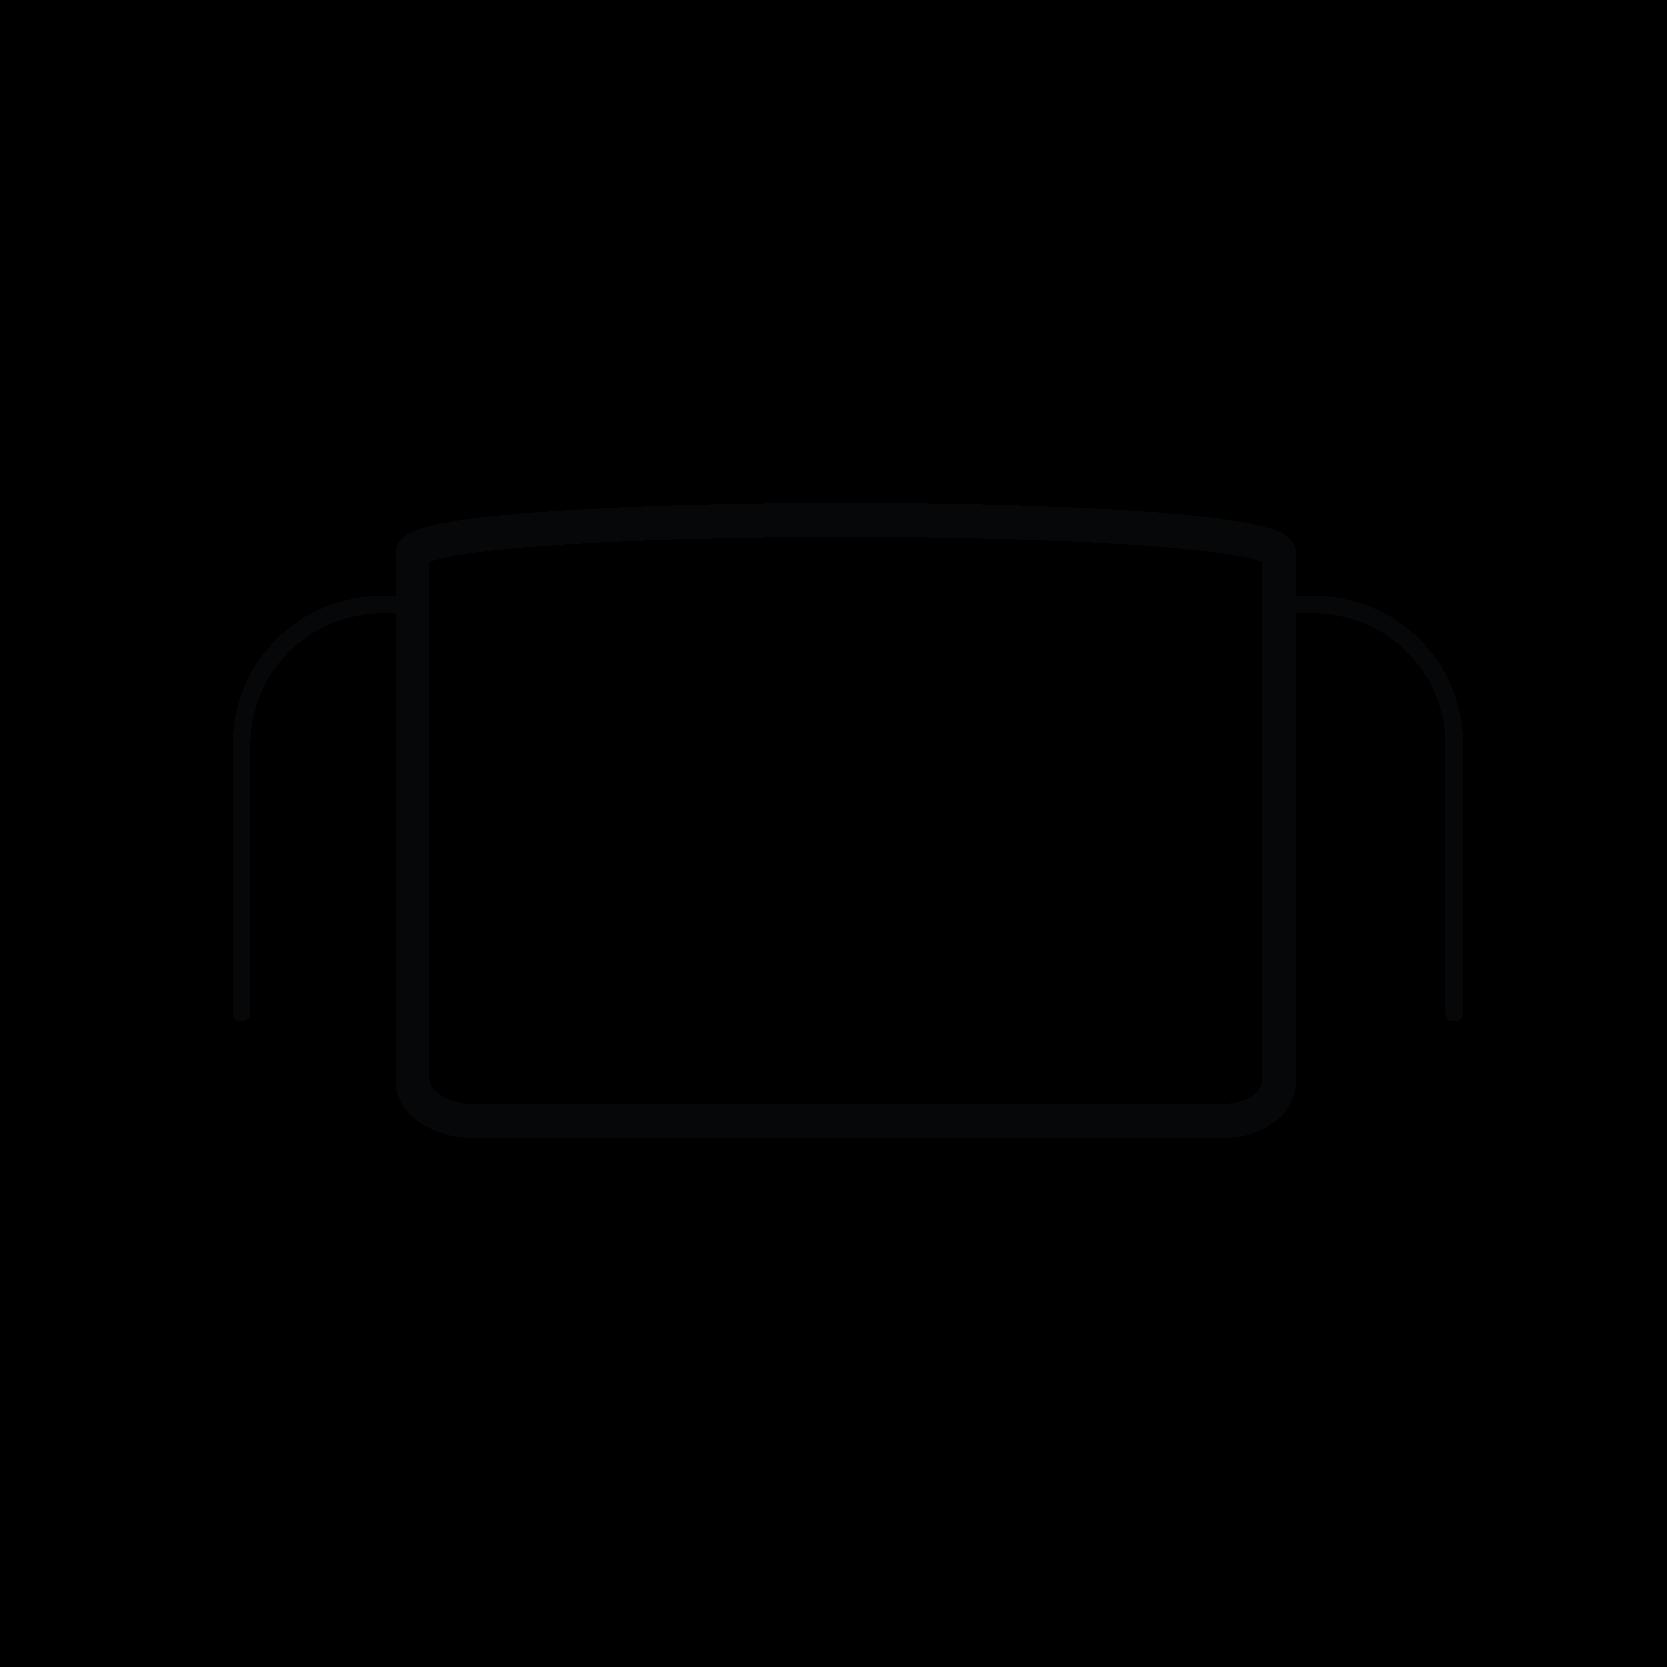 Barmann-Lendenschurze - Ikone